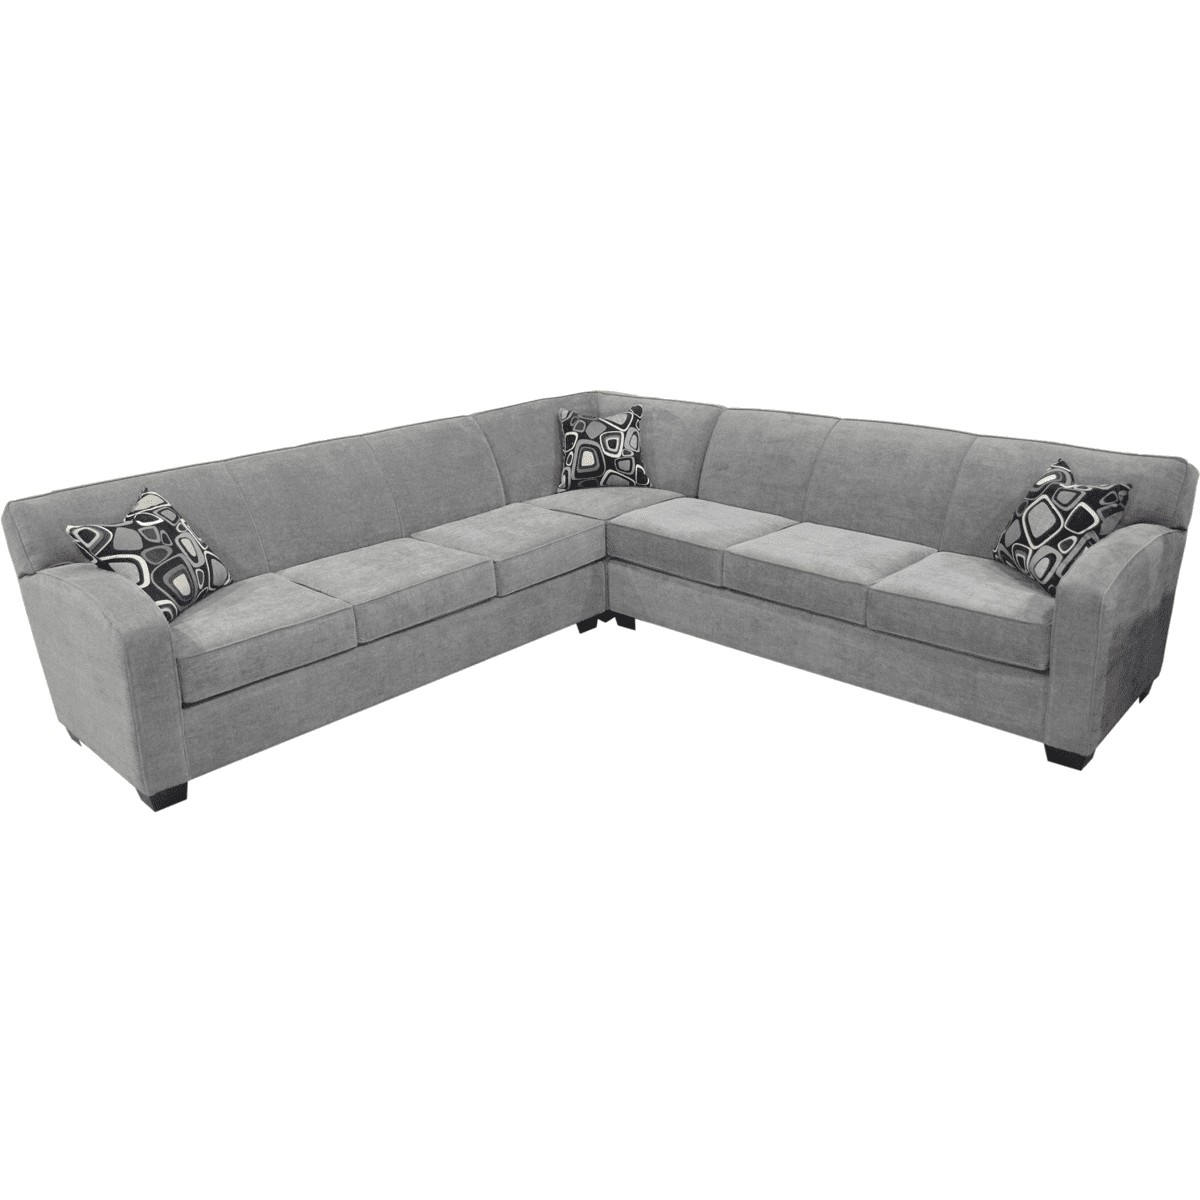 2031 Model Custom Made Sectional Sofa Condo Love